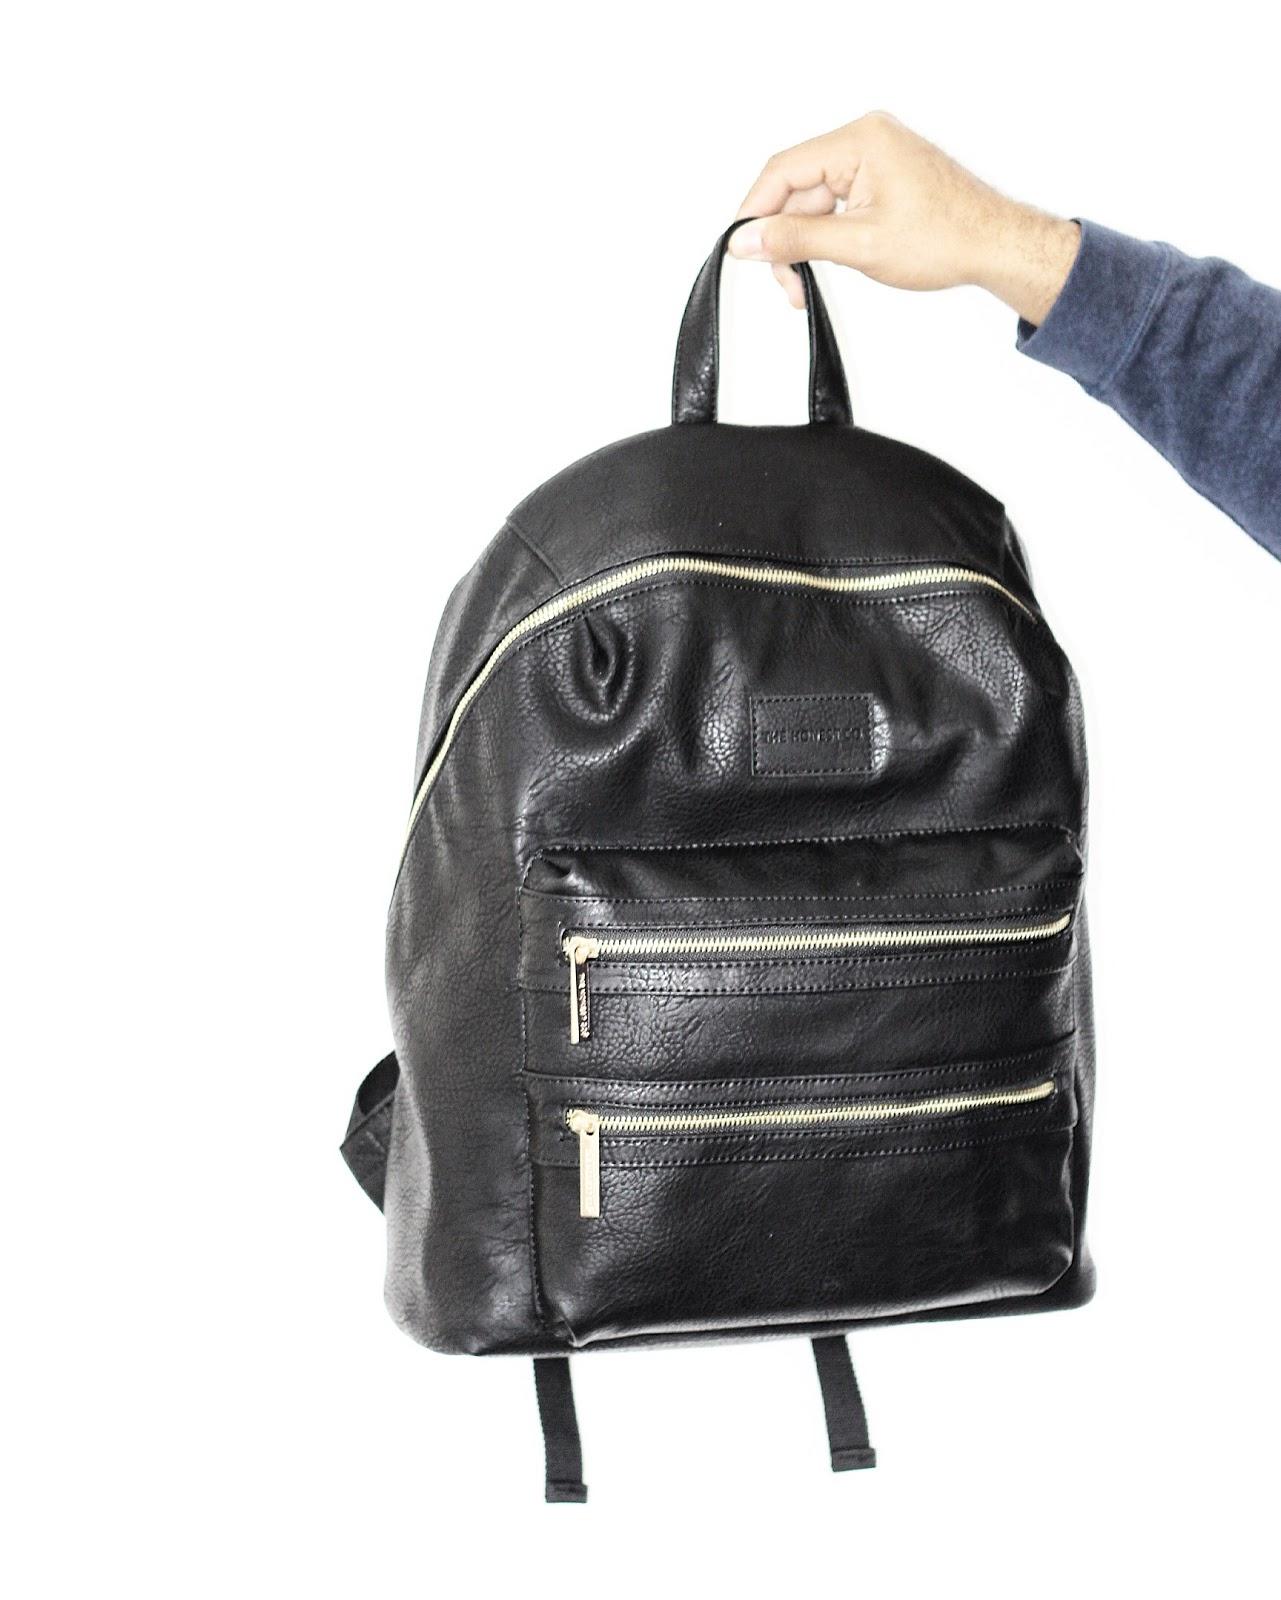 My Diaper Bag: Honest Co City Backpack